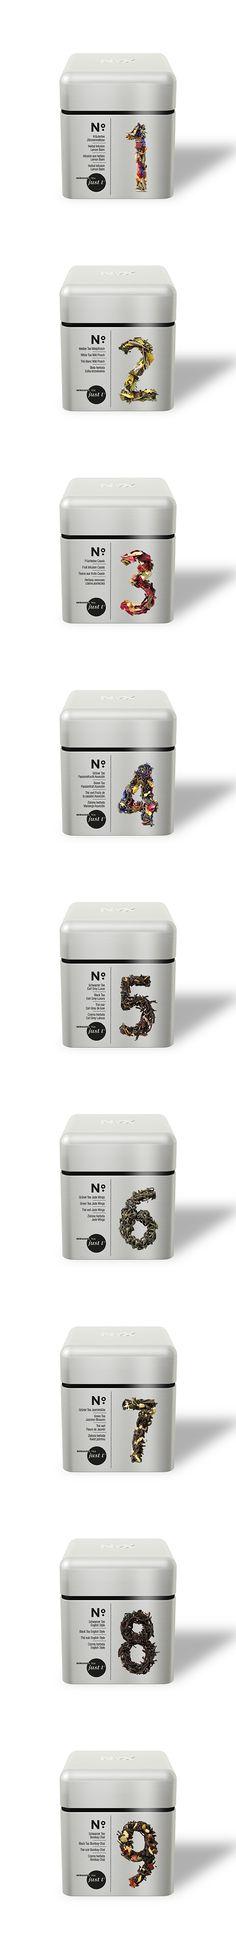 Just T packaging | Designer: Atelier Christian von der Heide - http://www.thedieline.com/blog/2012/11/14/just-t-black-label.html